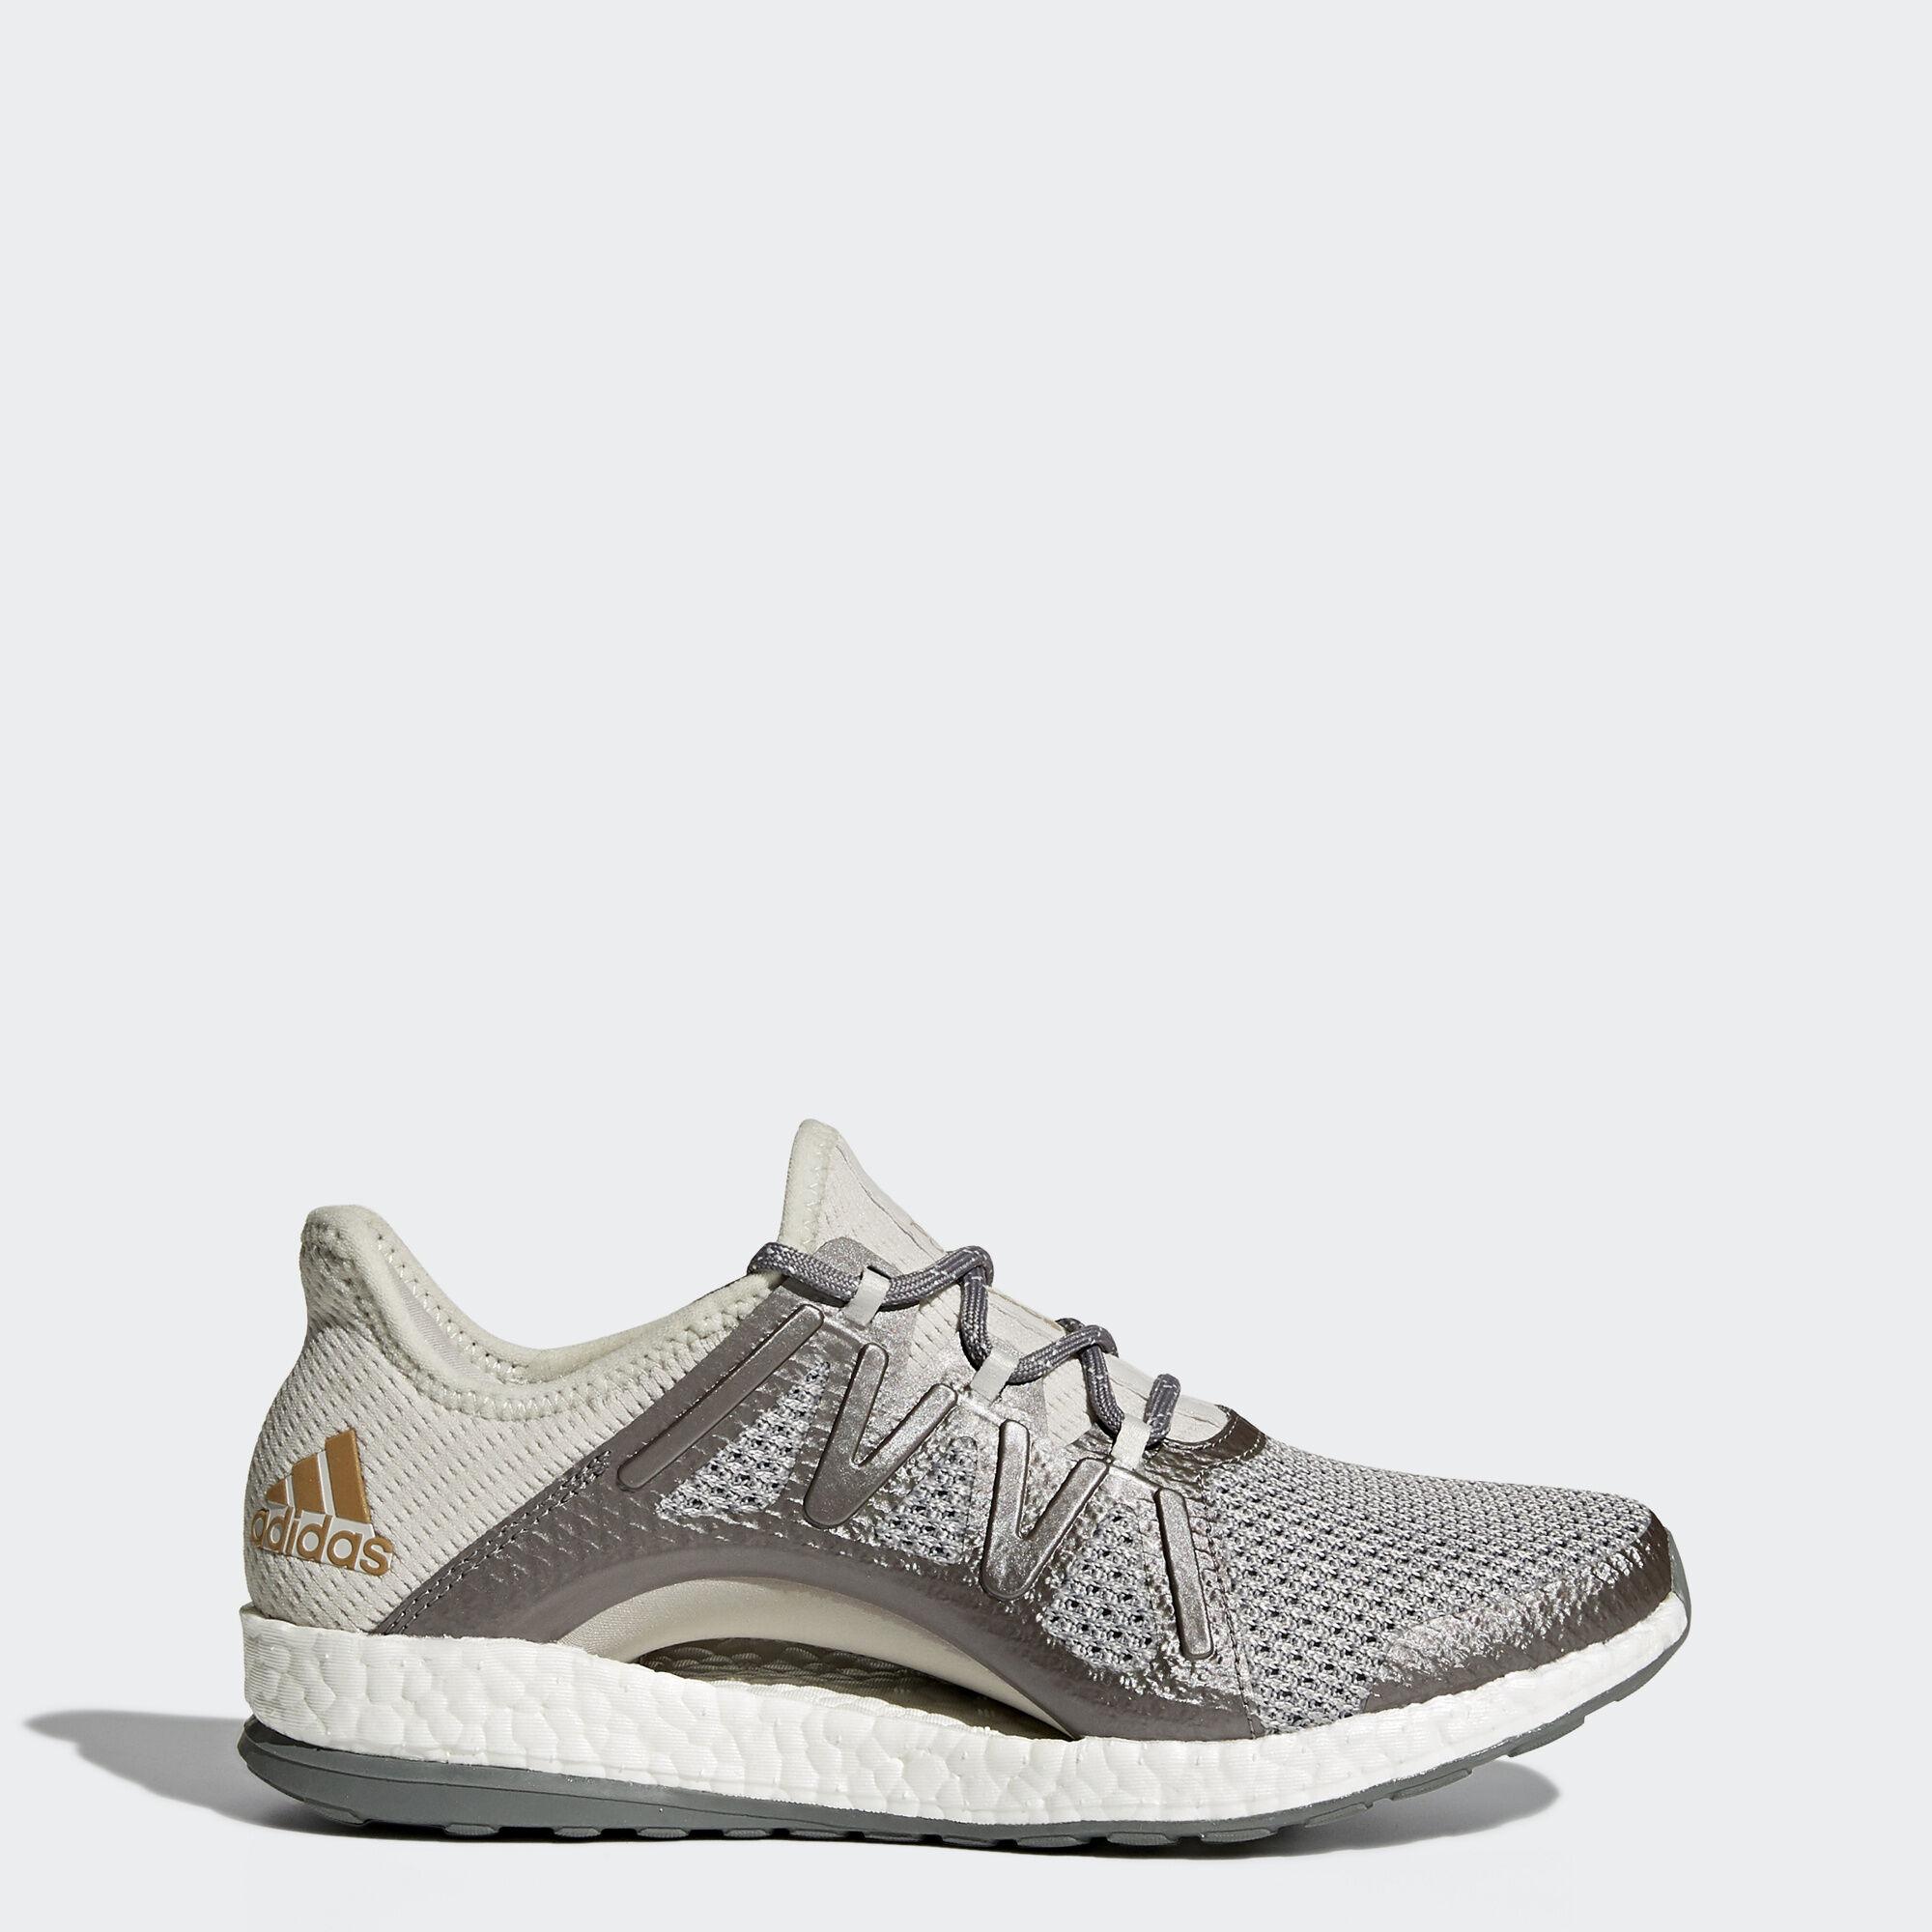 adidas - PureBOOST Xpose Shoes Grey One/Grey Three/Tactive Gold Metallic  BA8271. Women Running